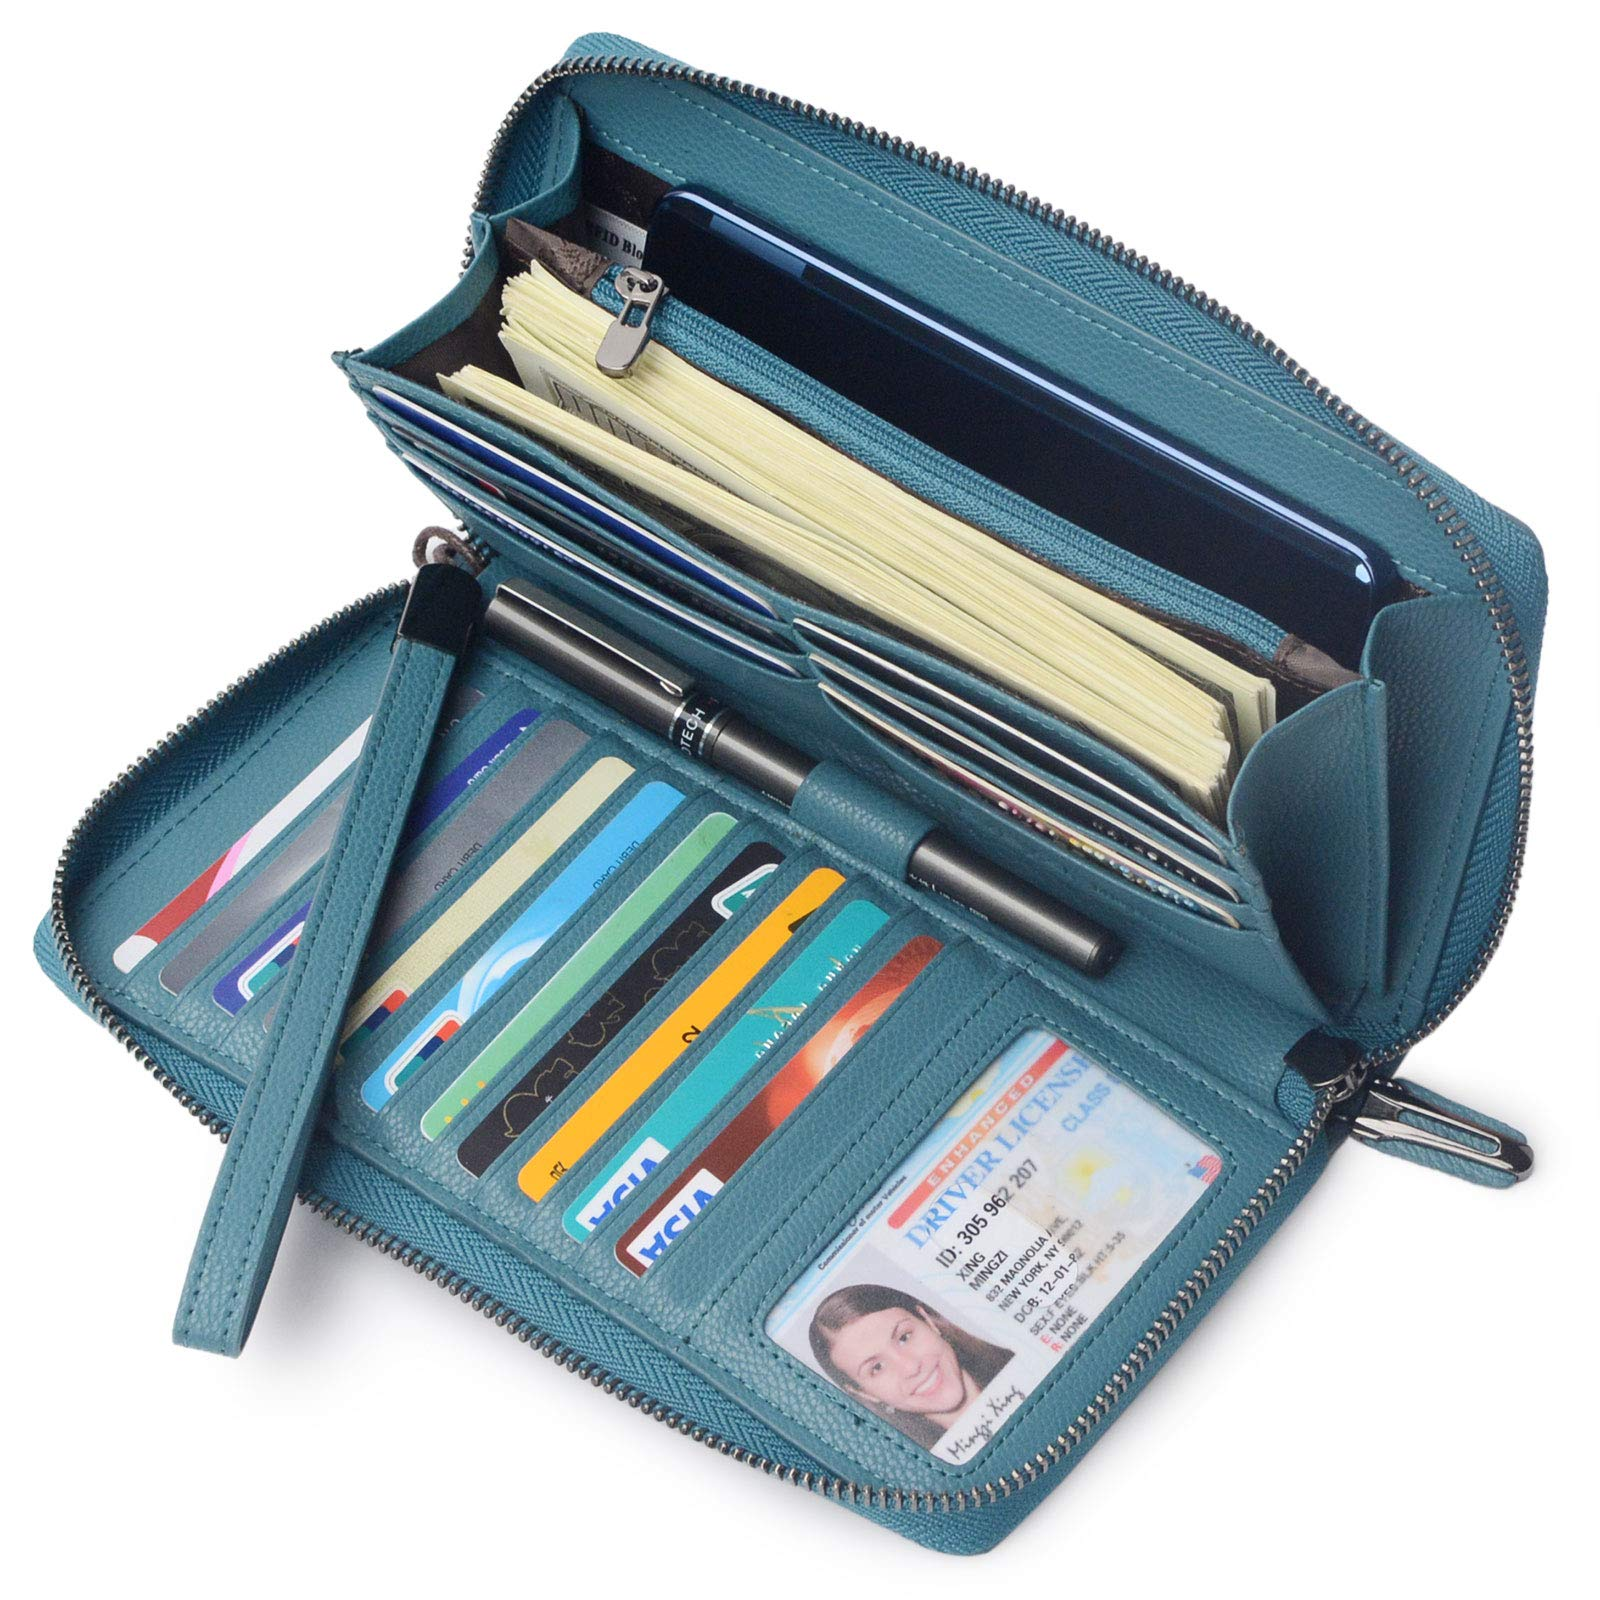 Women RFID Blocking Wallet Leather Zip Around Phone Clutch Large Travel Purse Wristlet (Lake Blue) by Bveyzi